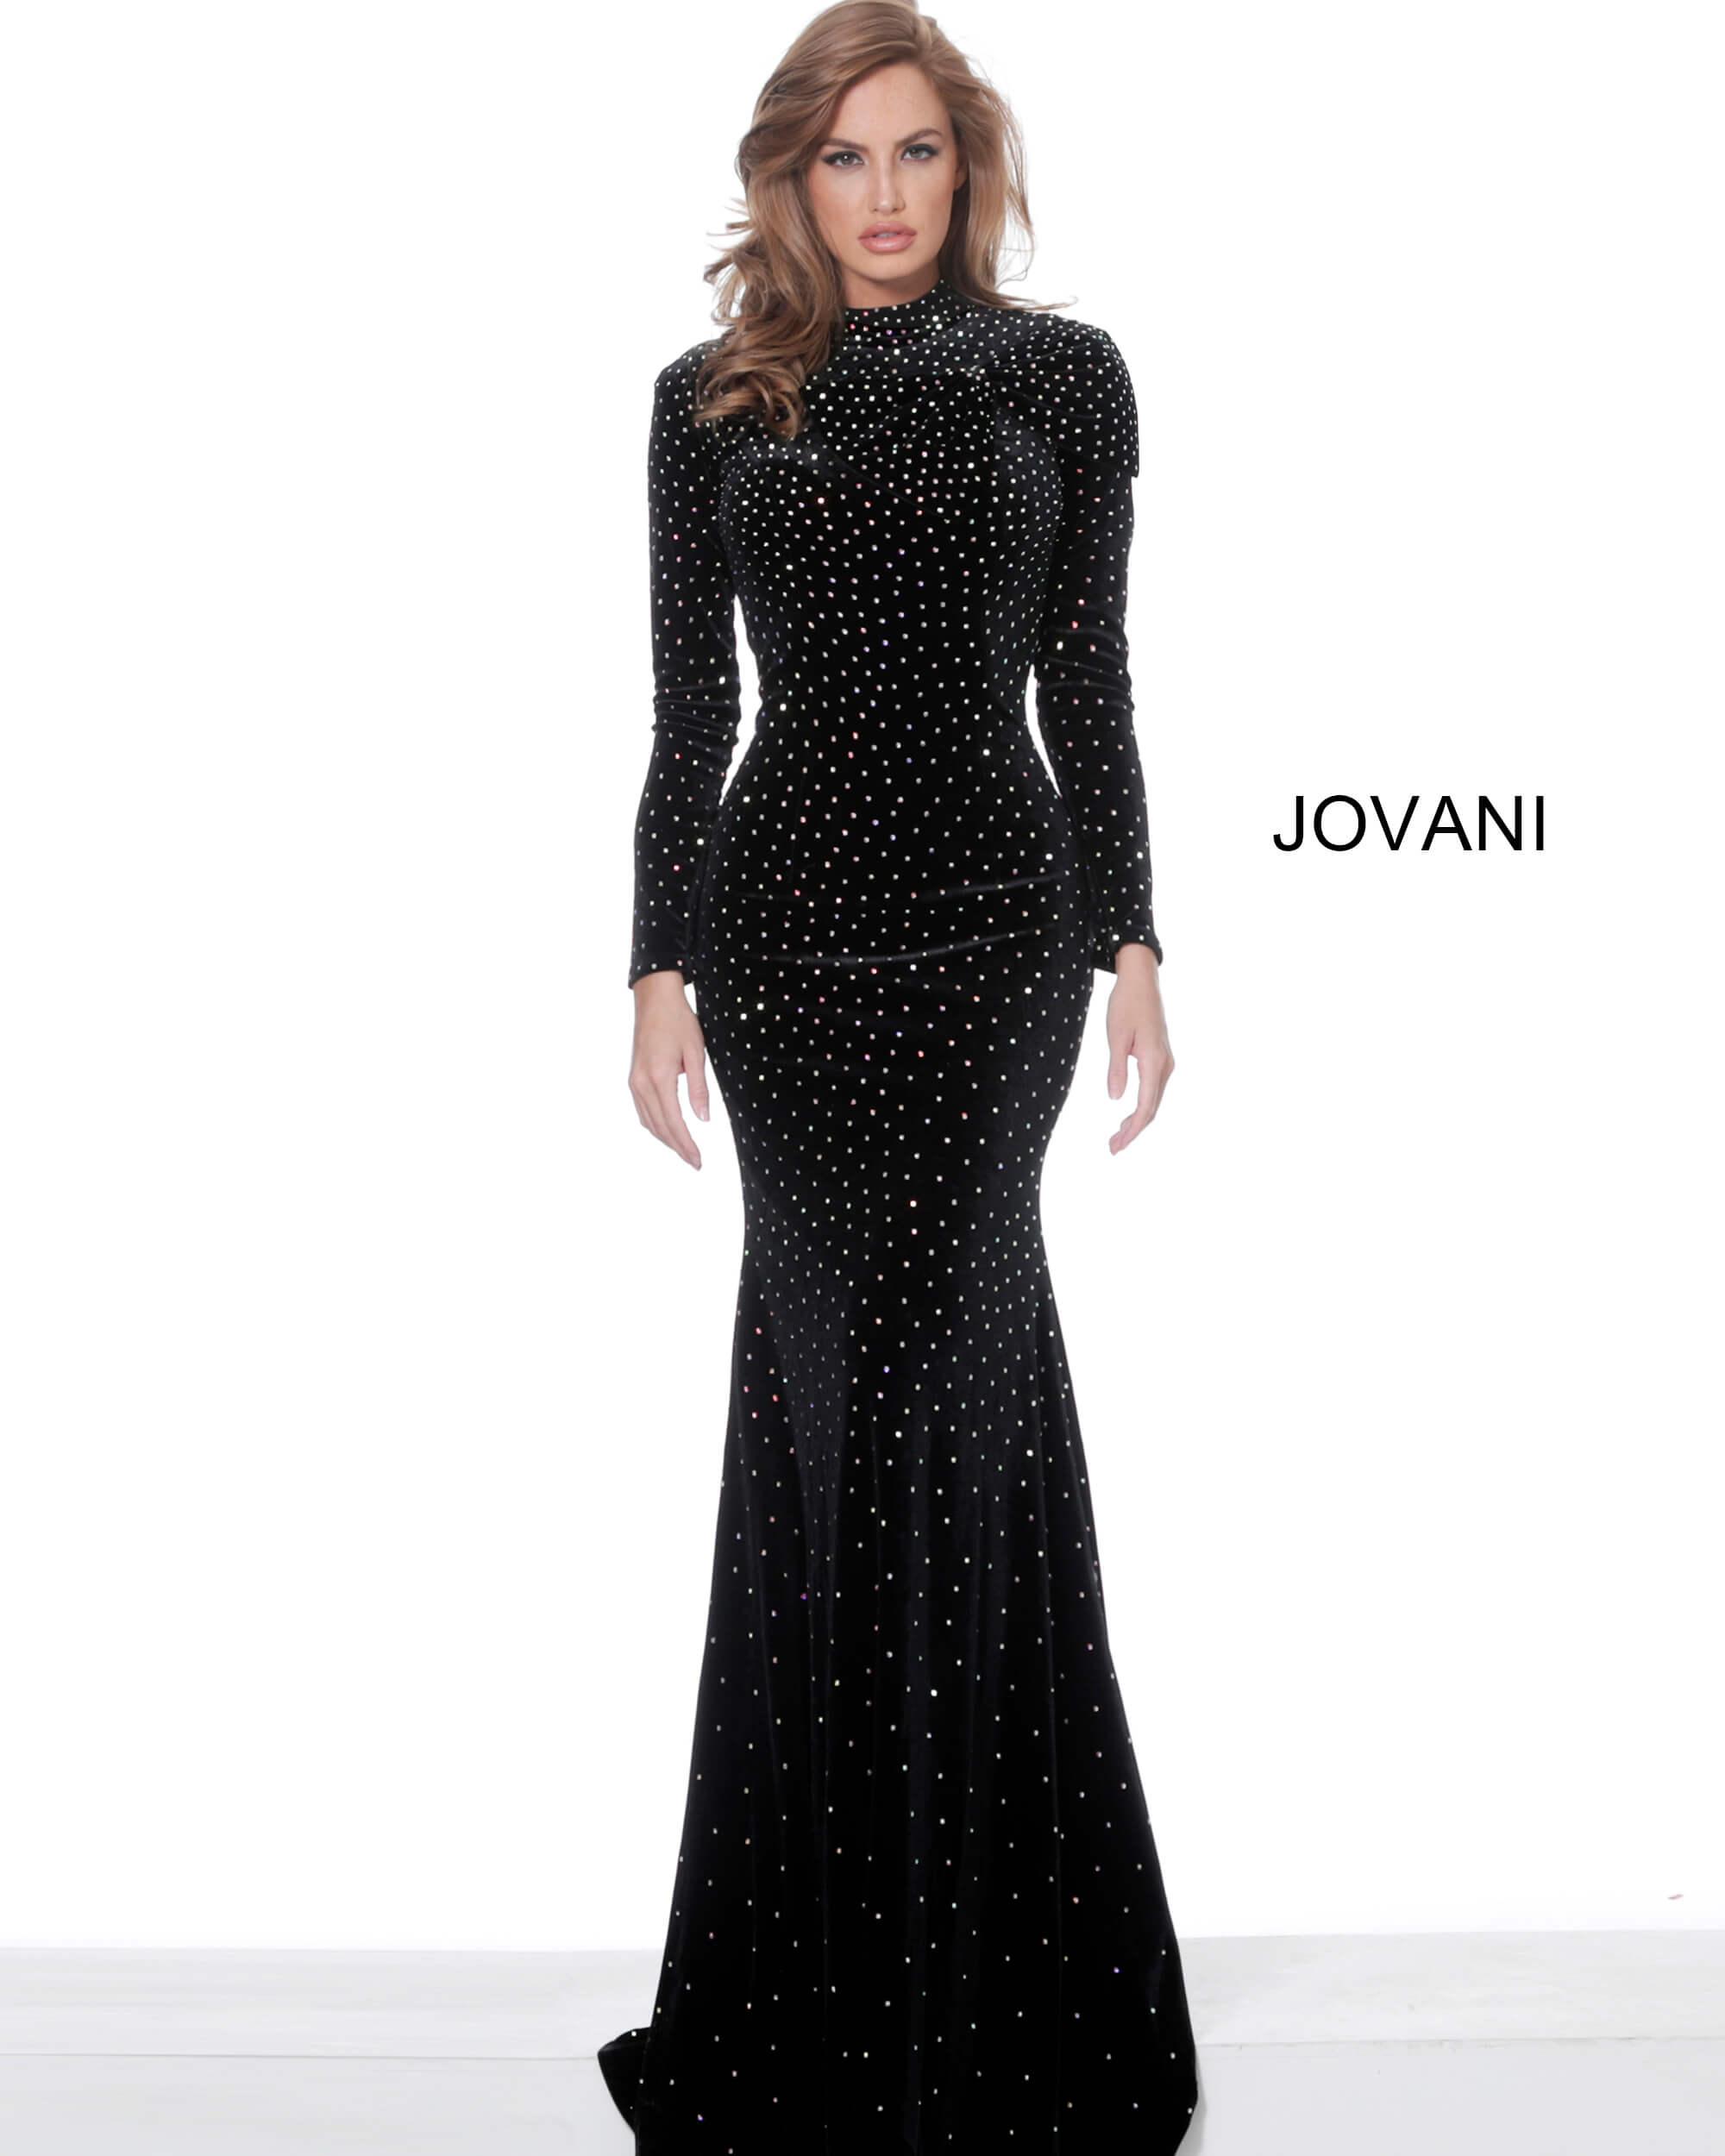 Wedding Dresses 2019 Near Me: Jovani Fashion Designer Dresses